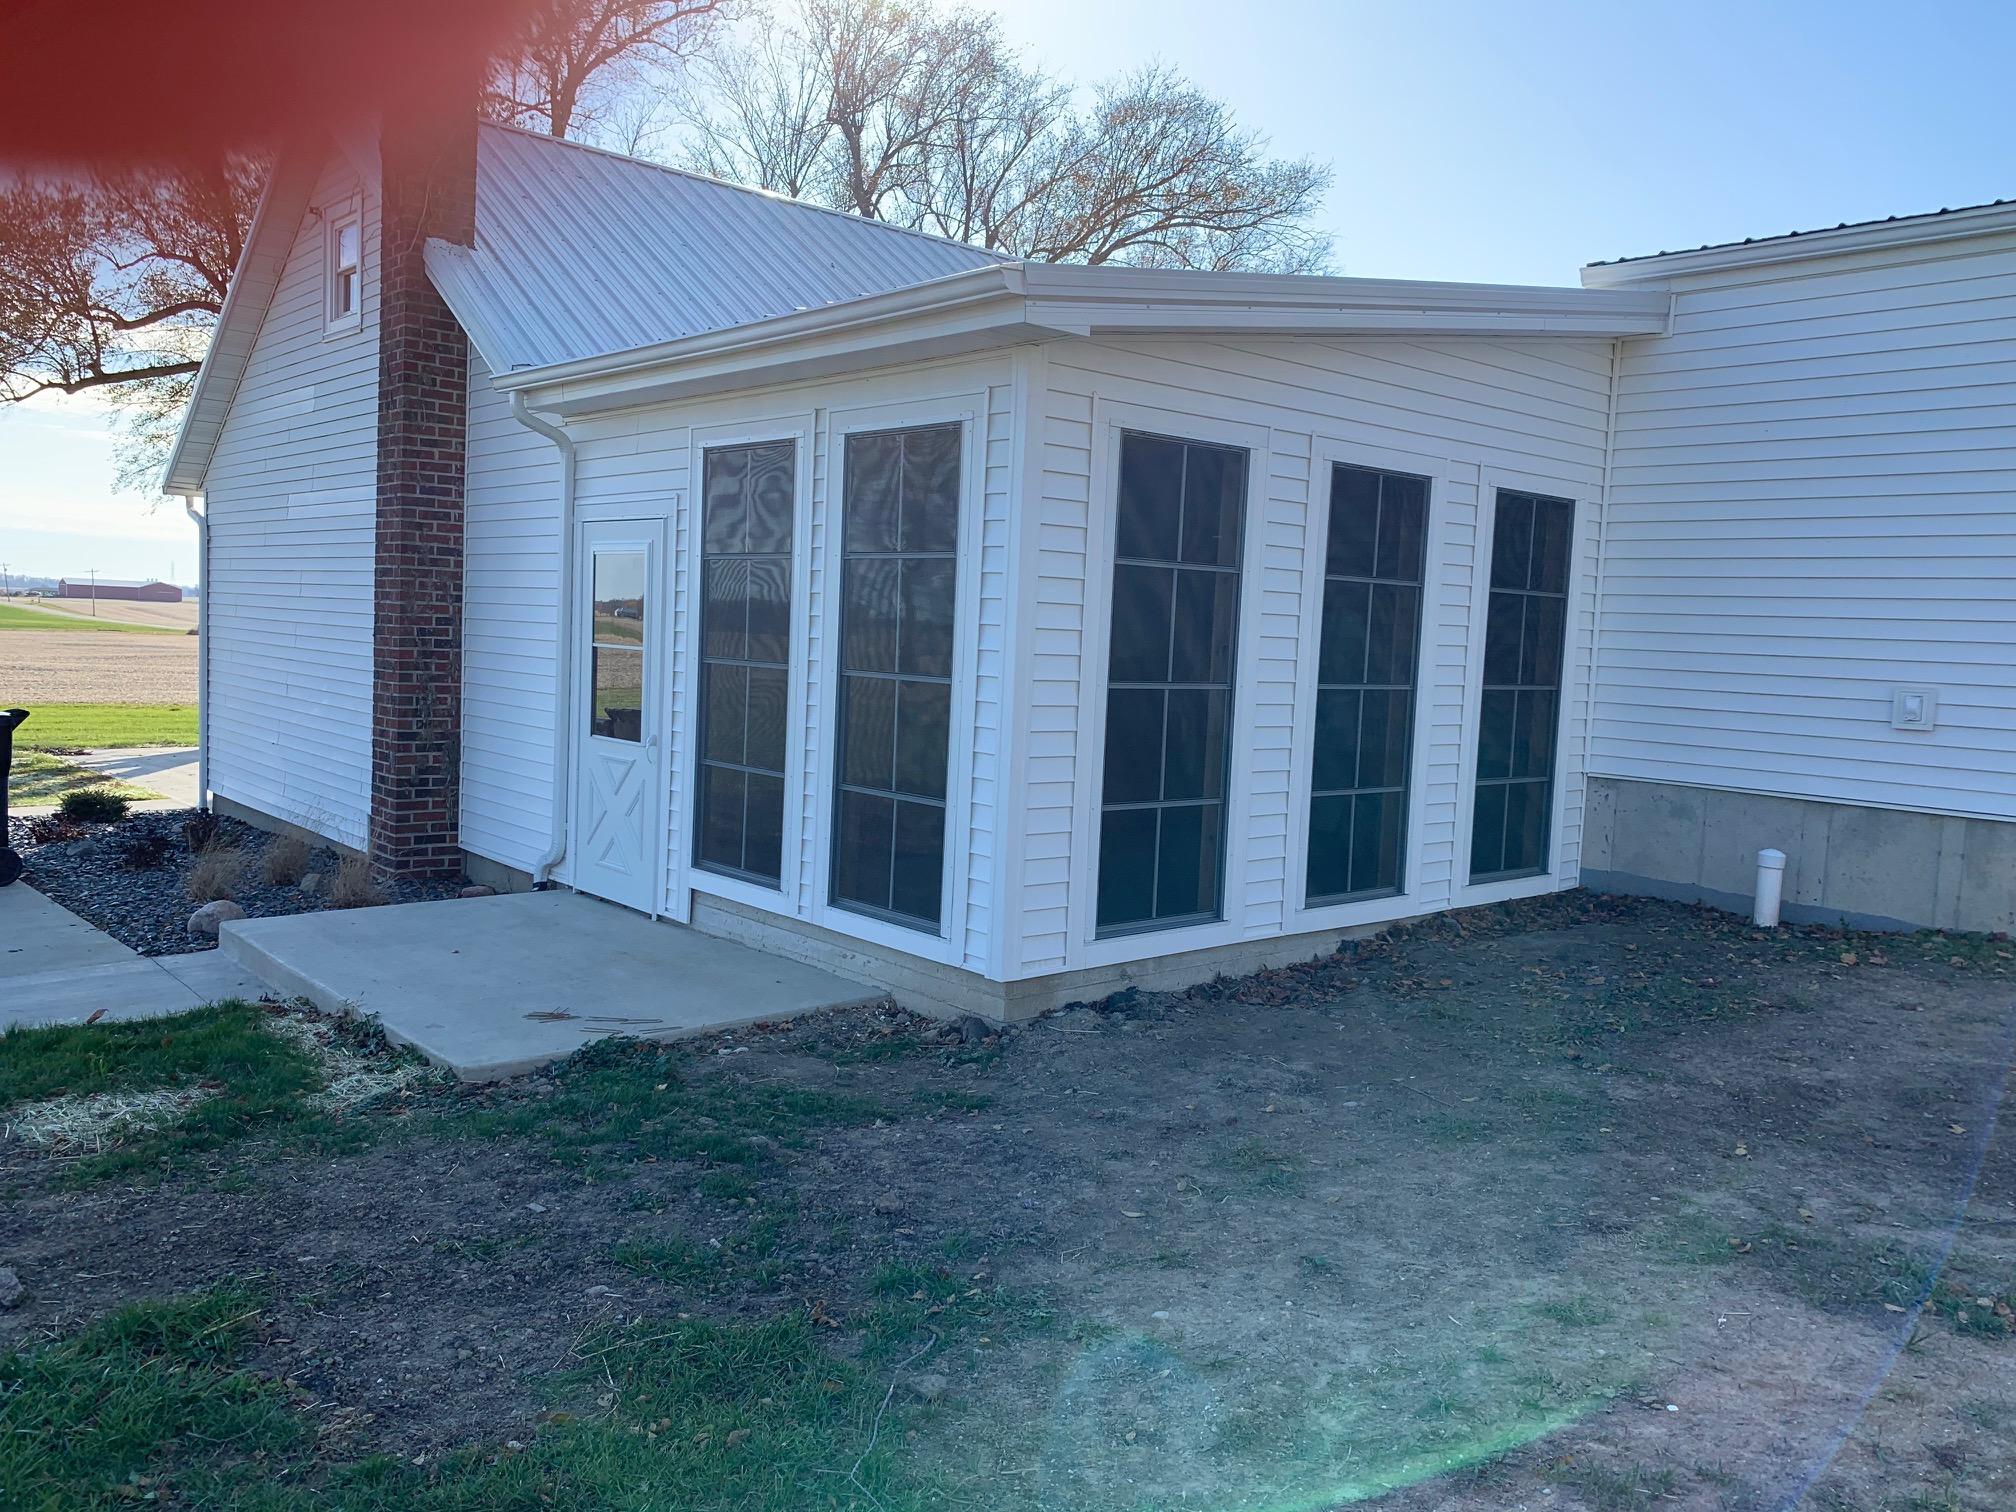 New-three-season-room-addition-by-Archadeck-of-Fort-Wayne